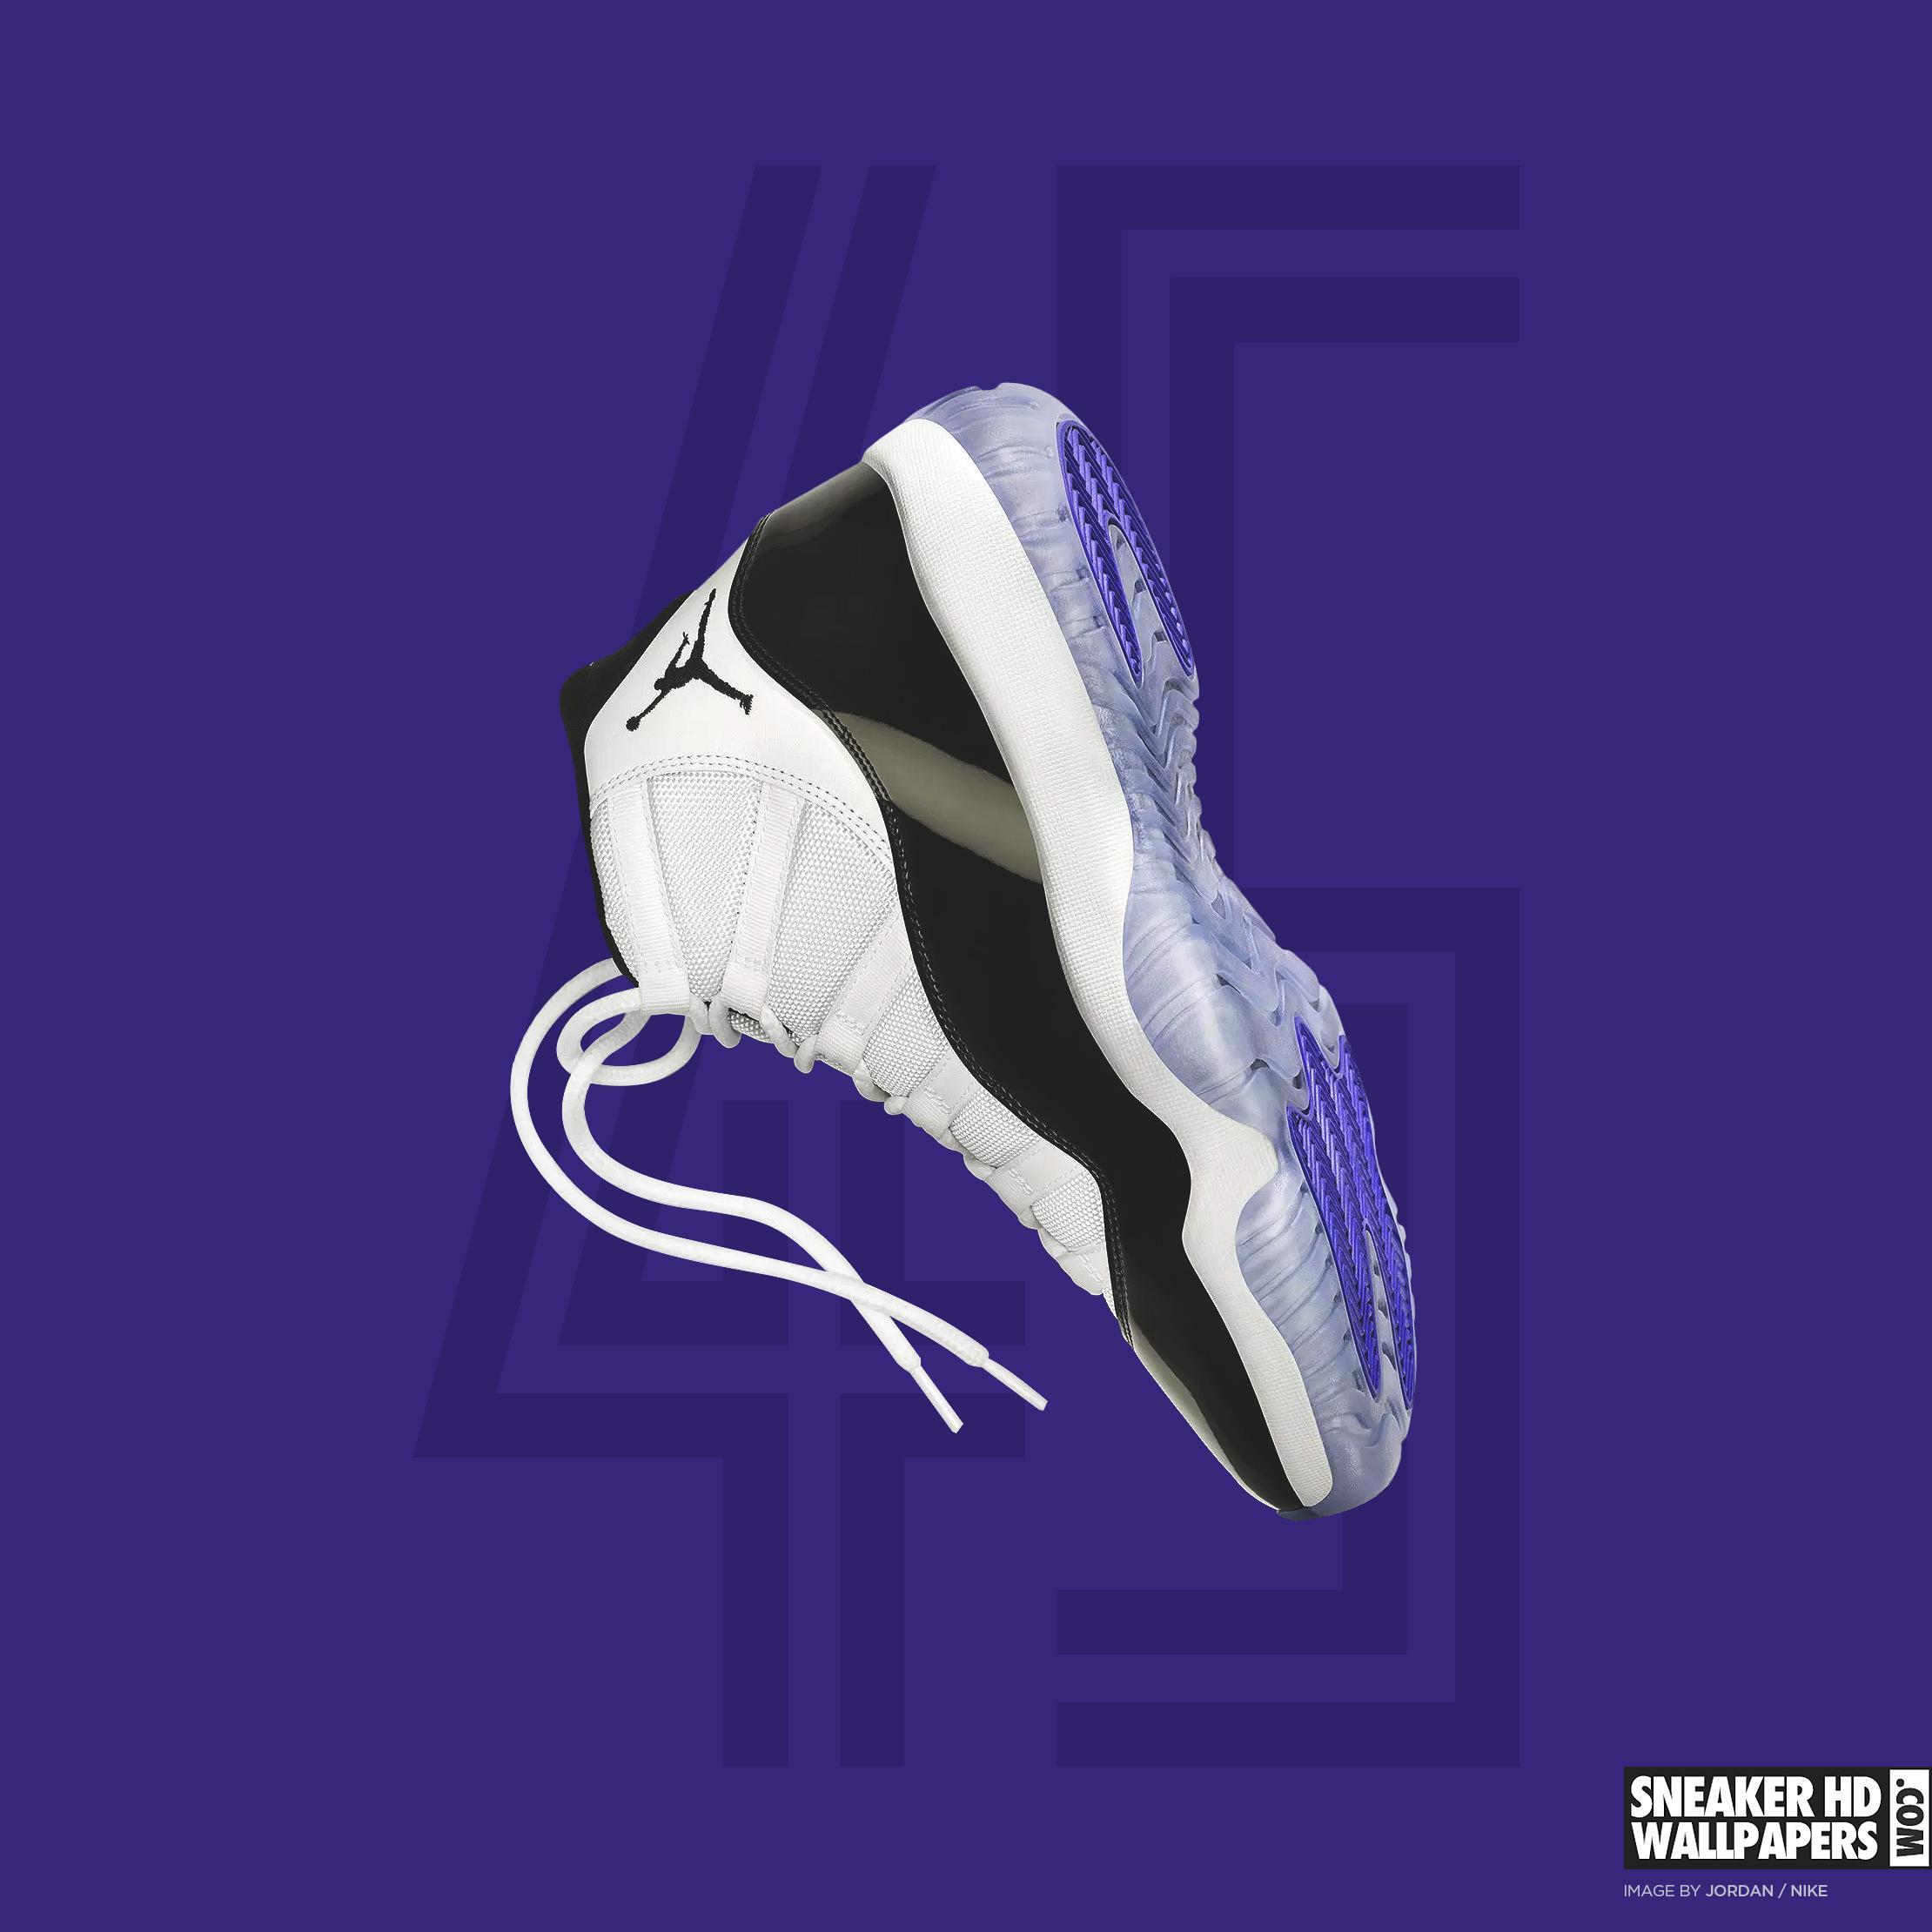 Air Jordan 11 Wallpapers Top Free Air Jordan 11 Backgrounds Wallpaperaccess